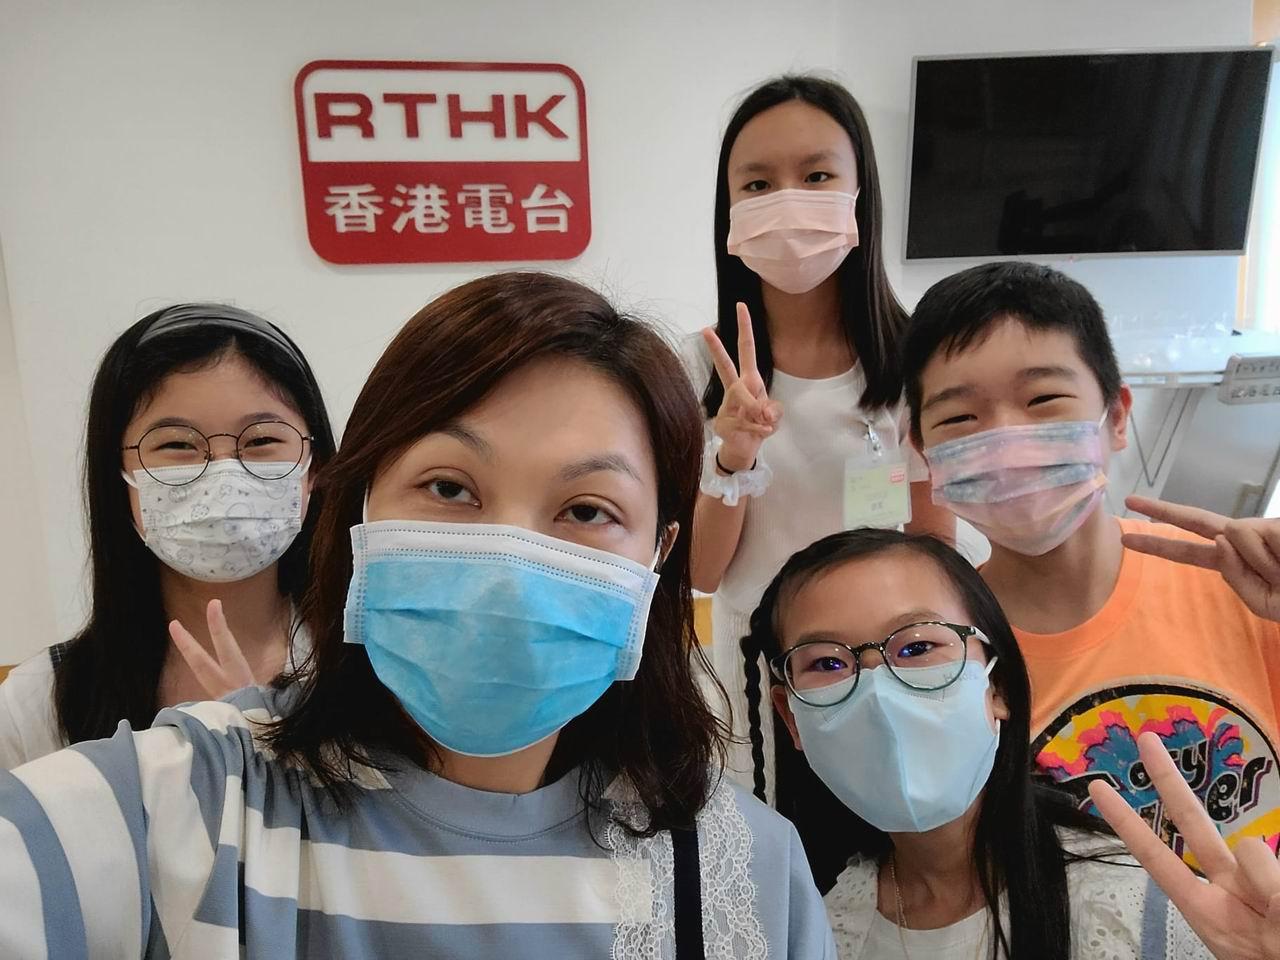 https://plkcjy.edu.hk/sites/default/files/whatsapp_image_2021-08-13_at_12.04.56.jpeg